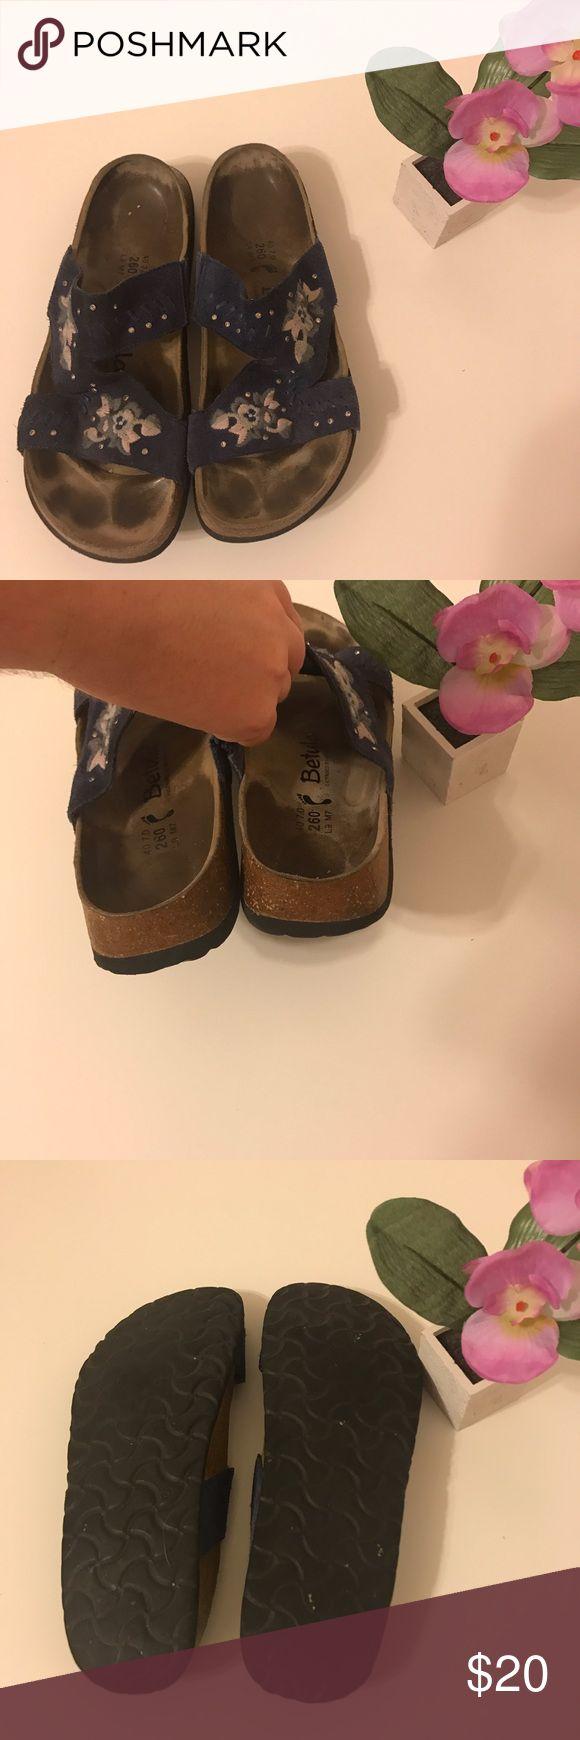 Birkenstock Betula sandals Gently pre loved Betula Birkenstock sandals. Size 40 Birkenstock Shoes Sandals